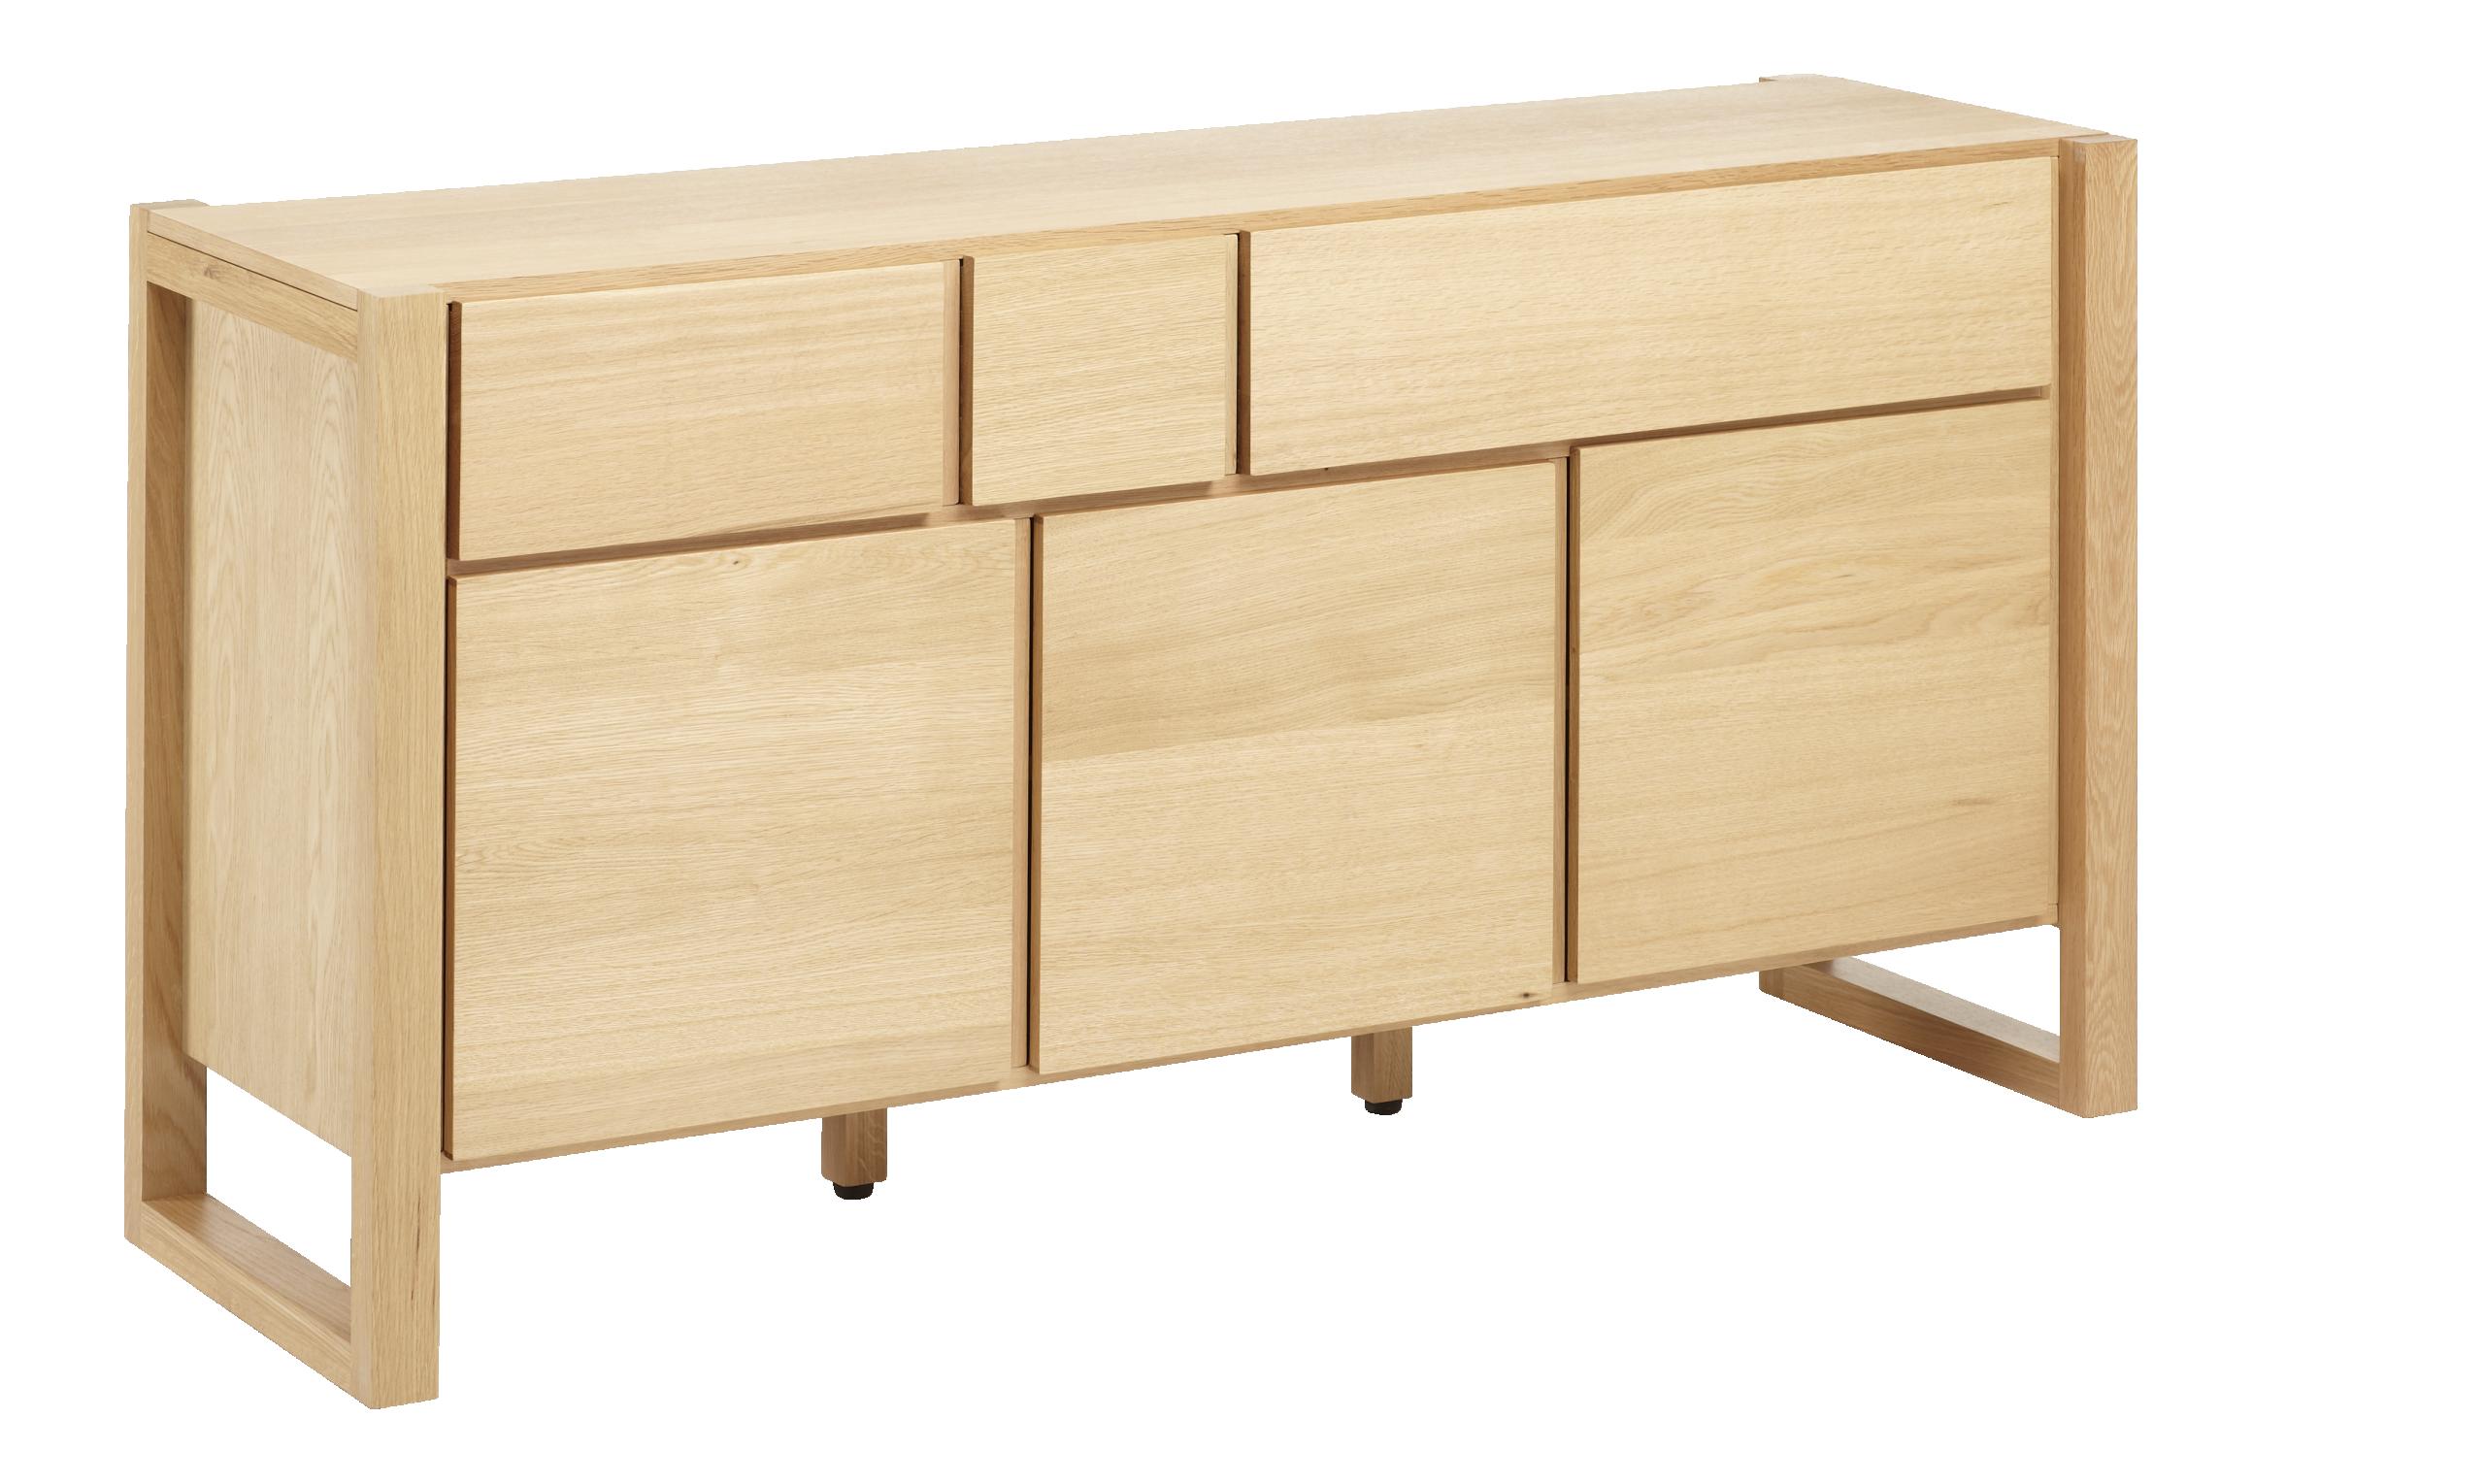 HANA Kitchen cabinet Natural Wood | House | Pinterest | Particle ...